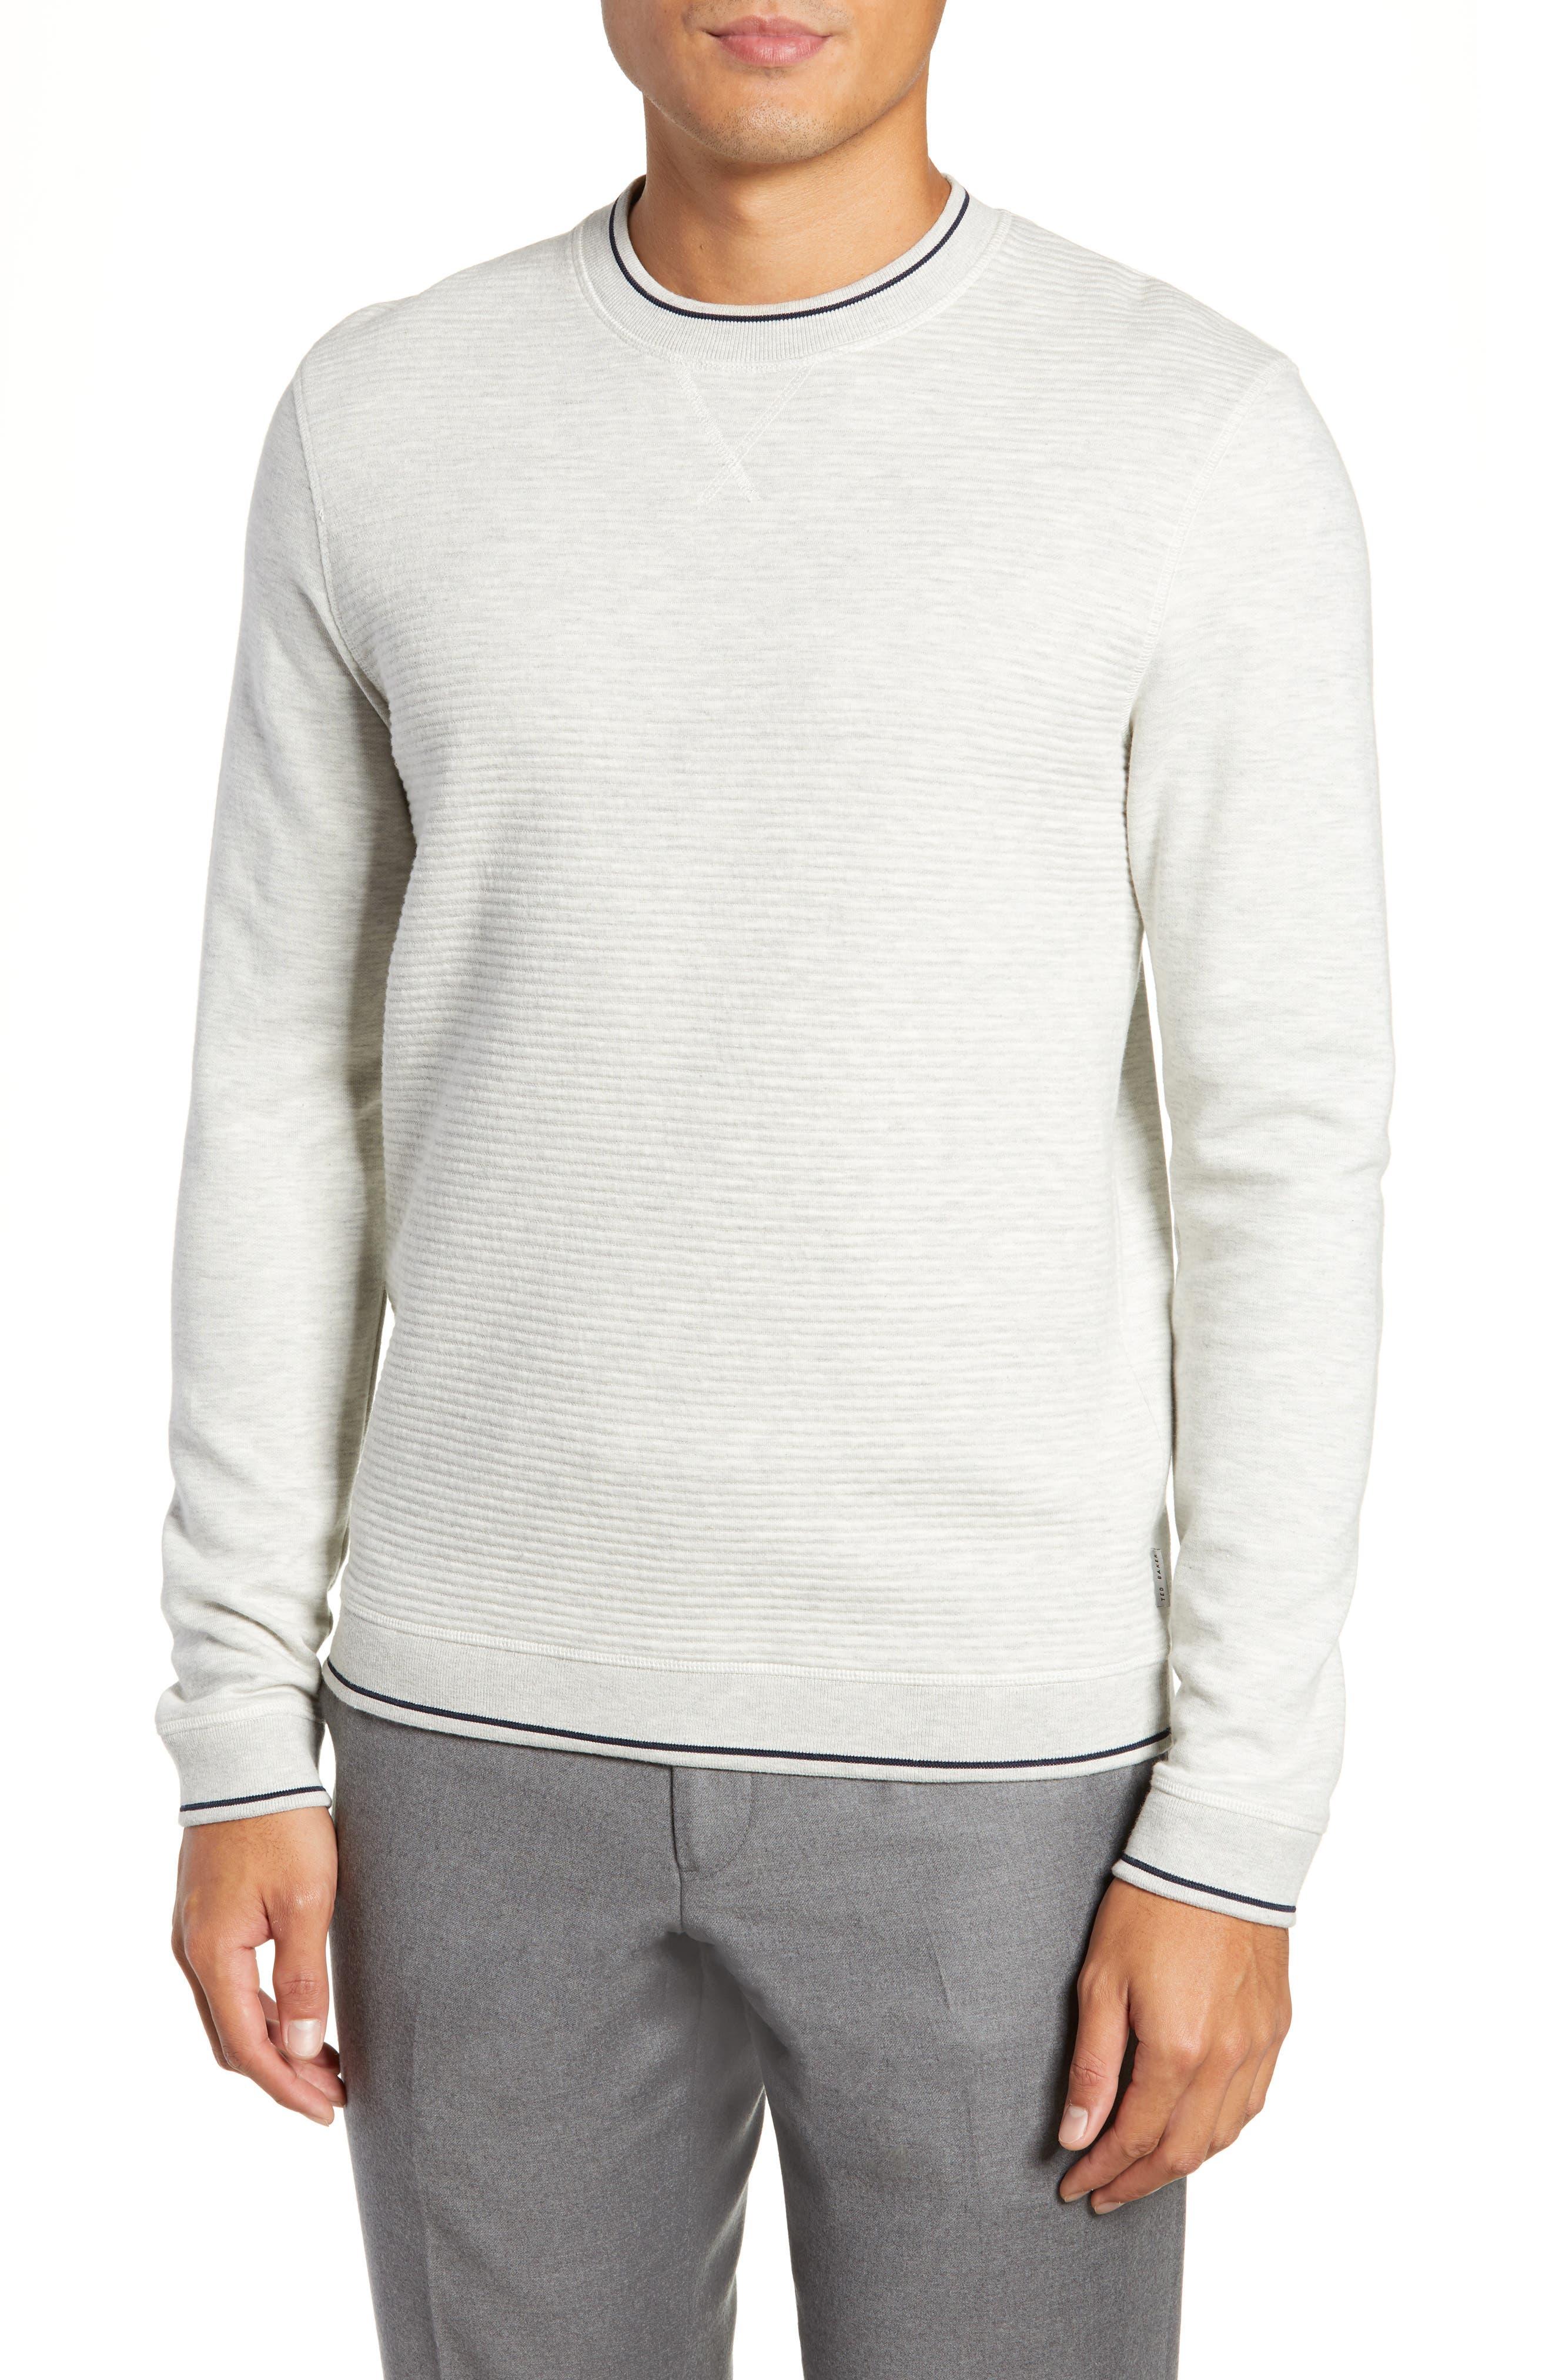 Magiics Slim Fit Quilted Sweatshirt,                         Main,                         color, LIGHT GREY